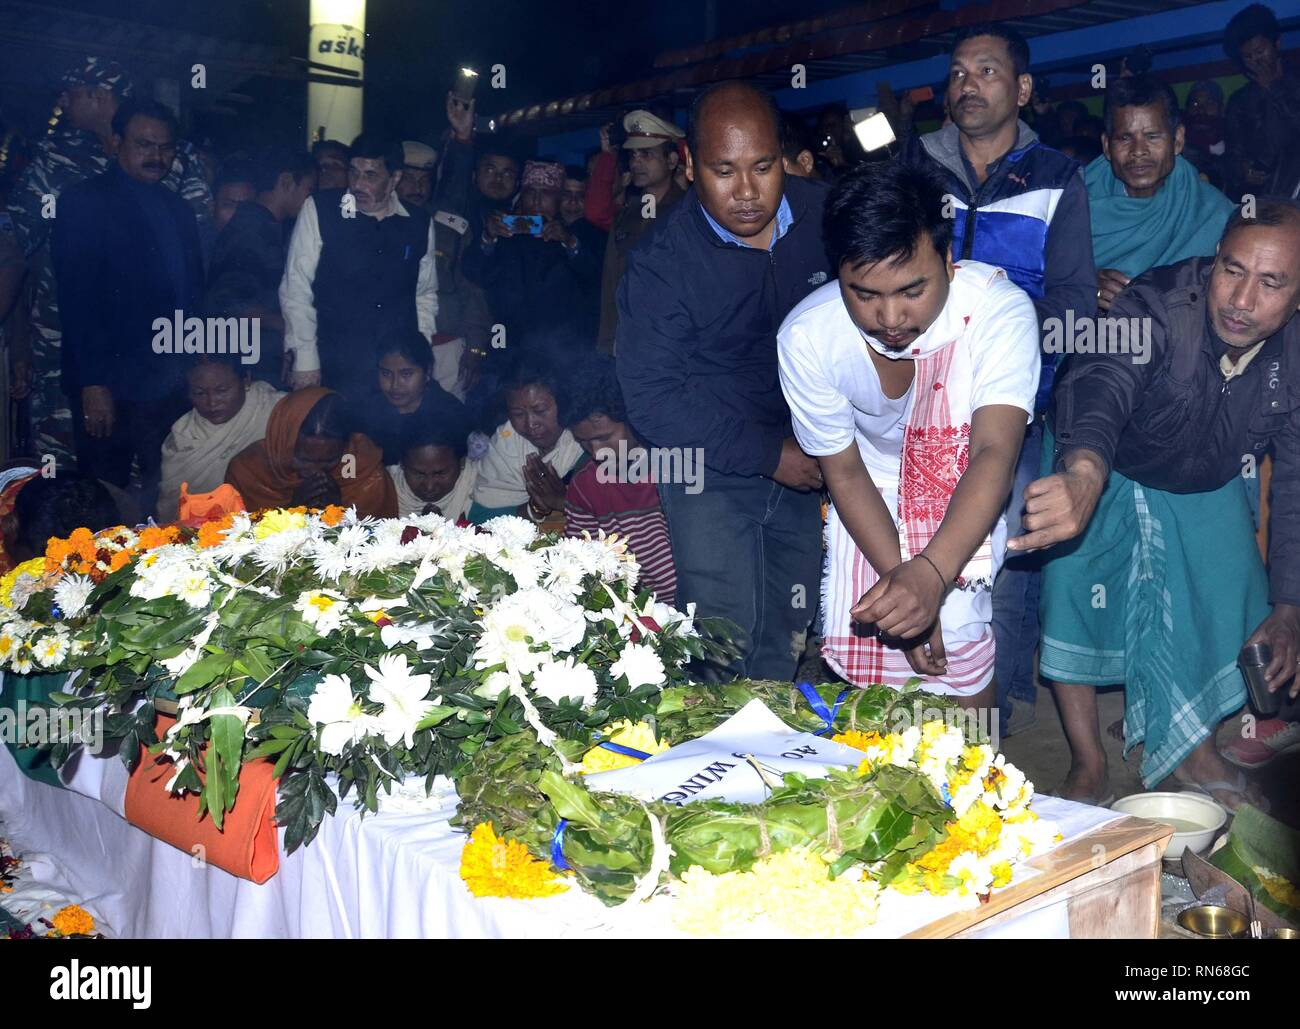 Assam, India. 16th Feb, 2019. Martyrs of Pulwama attack:Baksa,Assam,India:16 February 2019:: Dhananjay Basumatary son of slain CRPF Maneshwar Basumatary  lays wearth on the coffin of  CRPF Jawan Maneshwar Basumatary at Tamulpur In Baksa District , Saturday, Feb. 16, 2019. Credit: Hafiz Ahmed/Alamy Live News - Stock Image